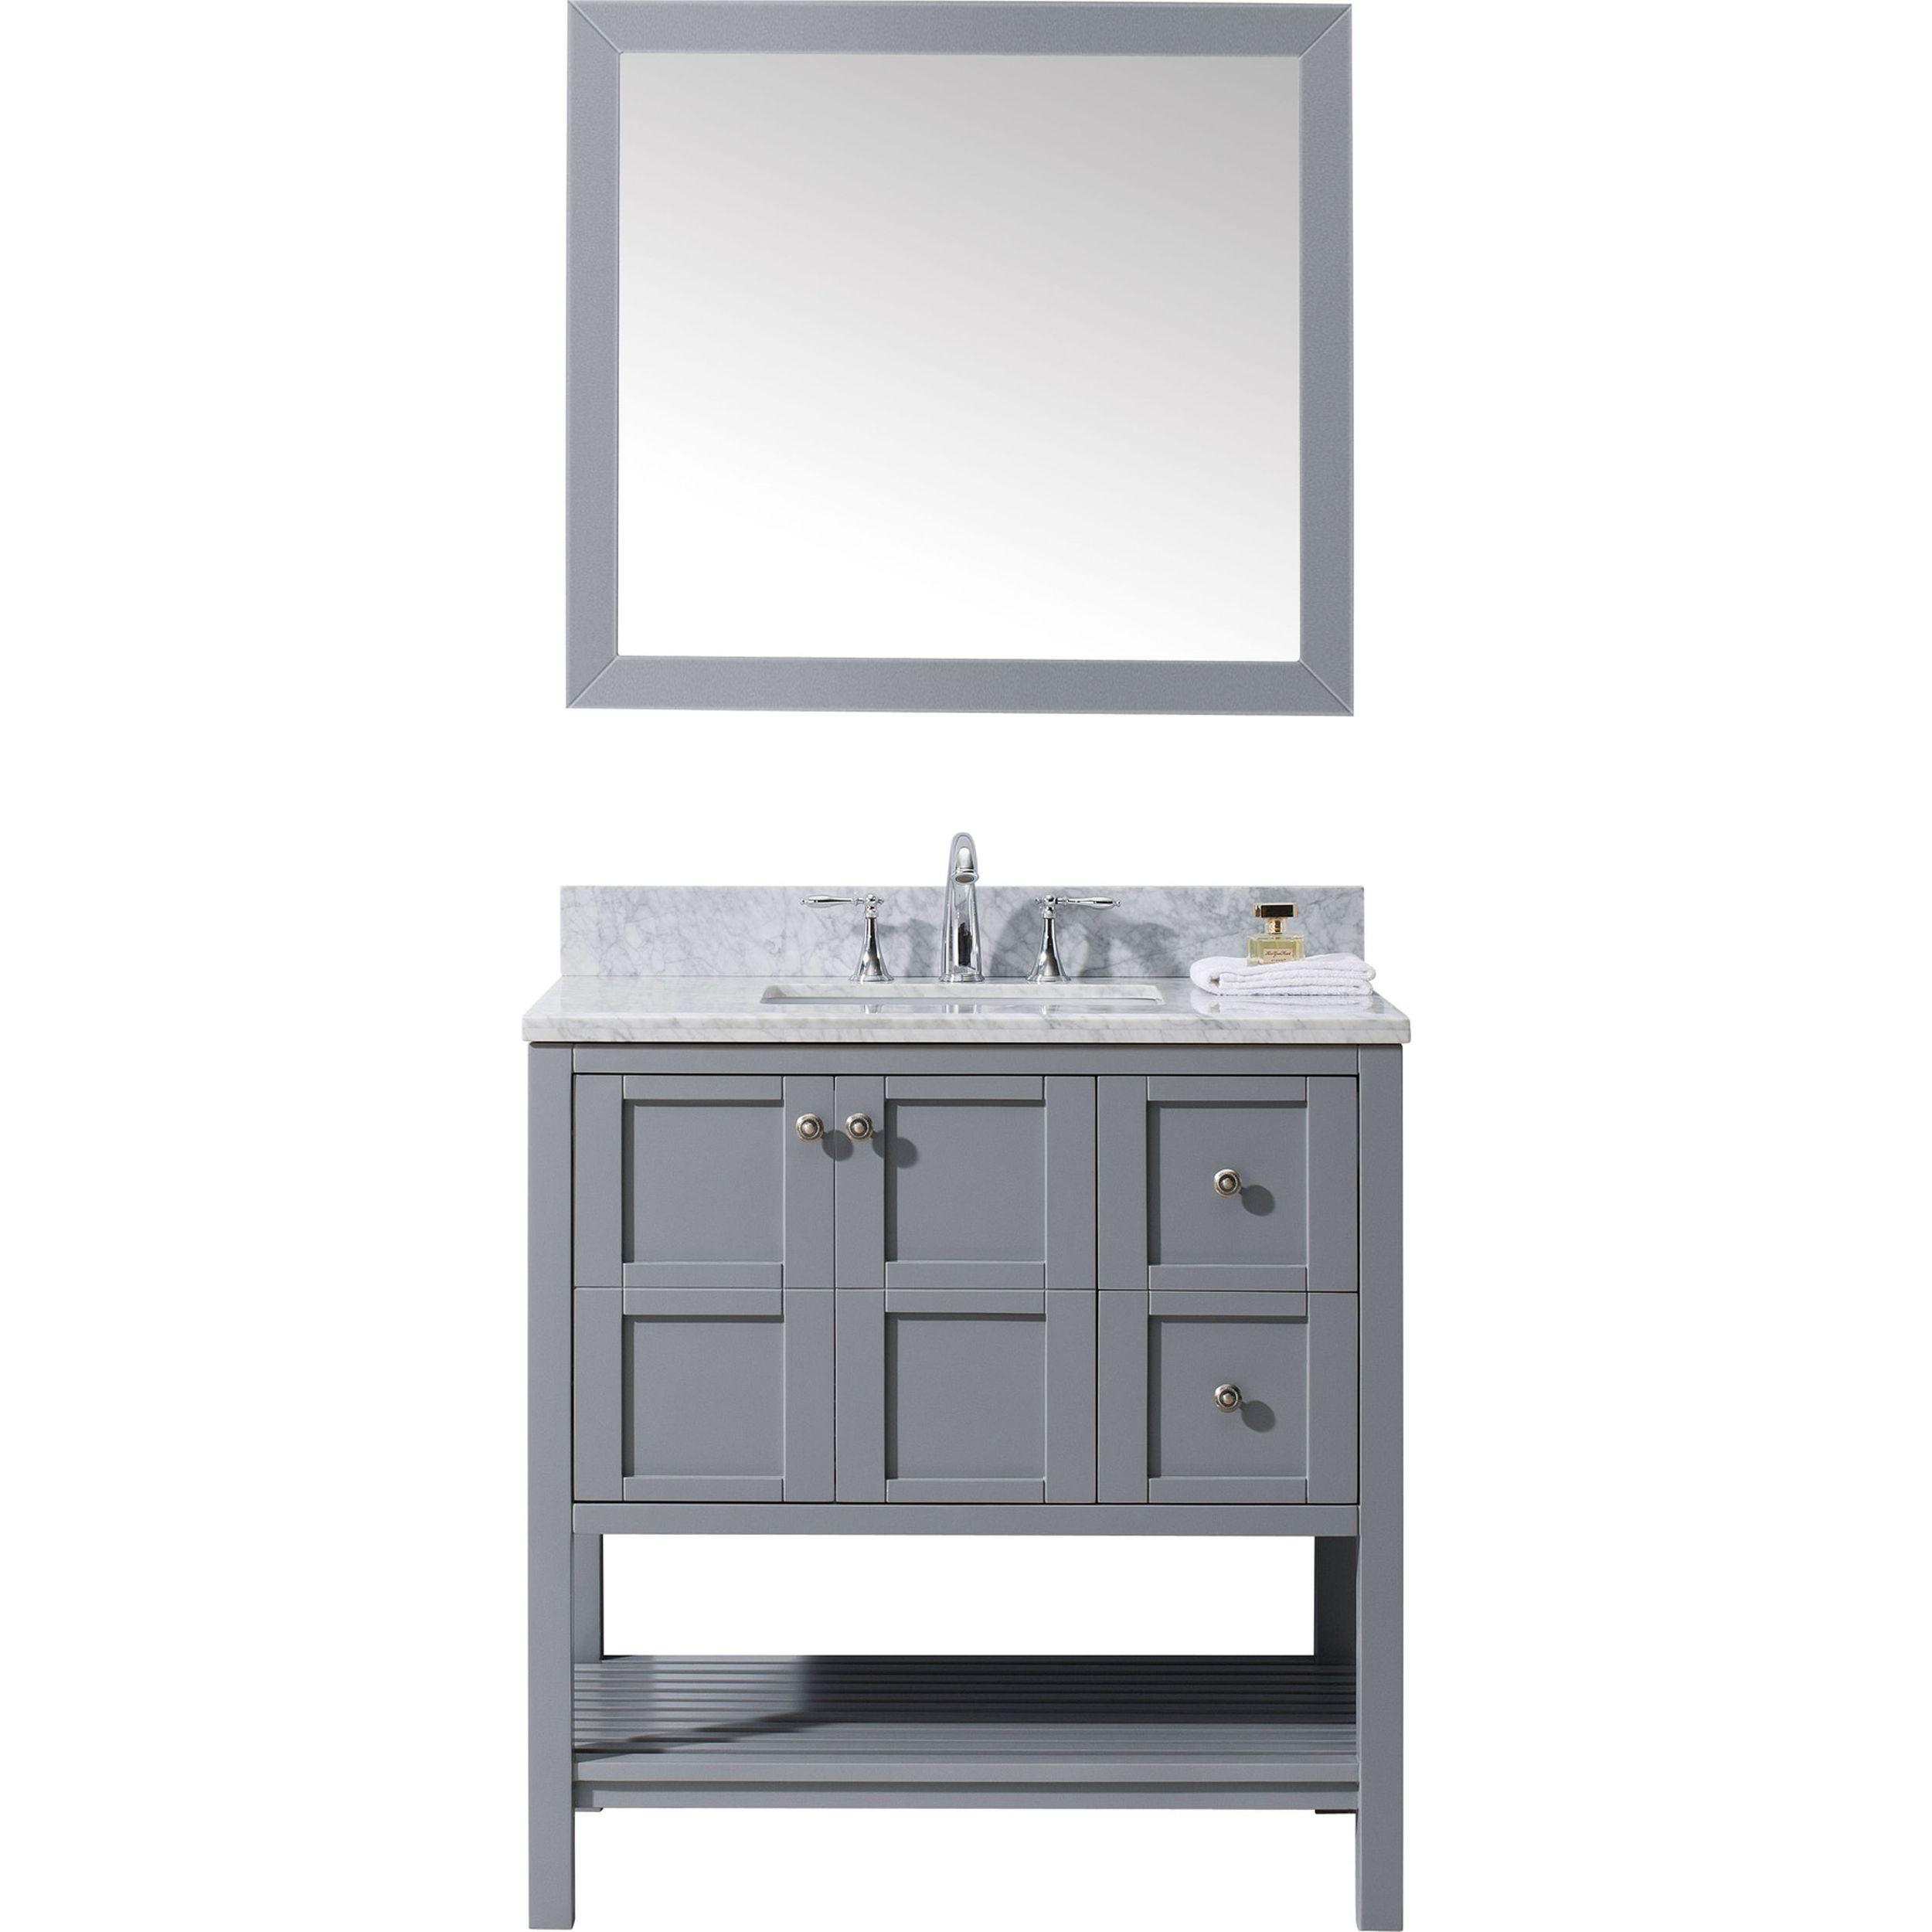 Virtu ES-30036-WMSQ-GR Winterfell 36 Inch Single Bathroom Vanity Set In Grey